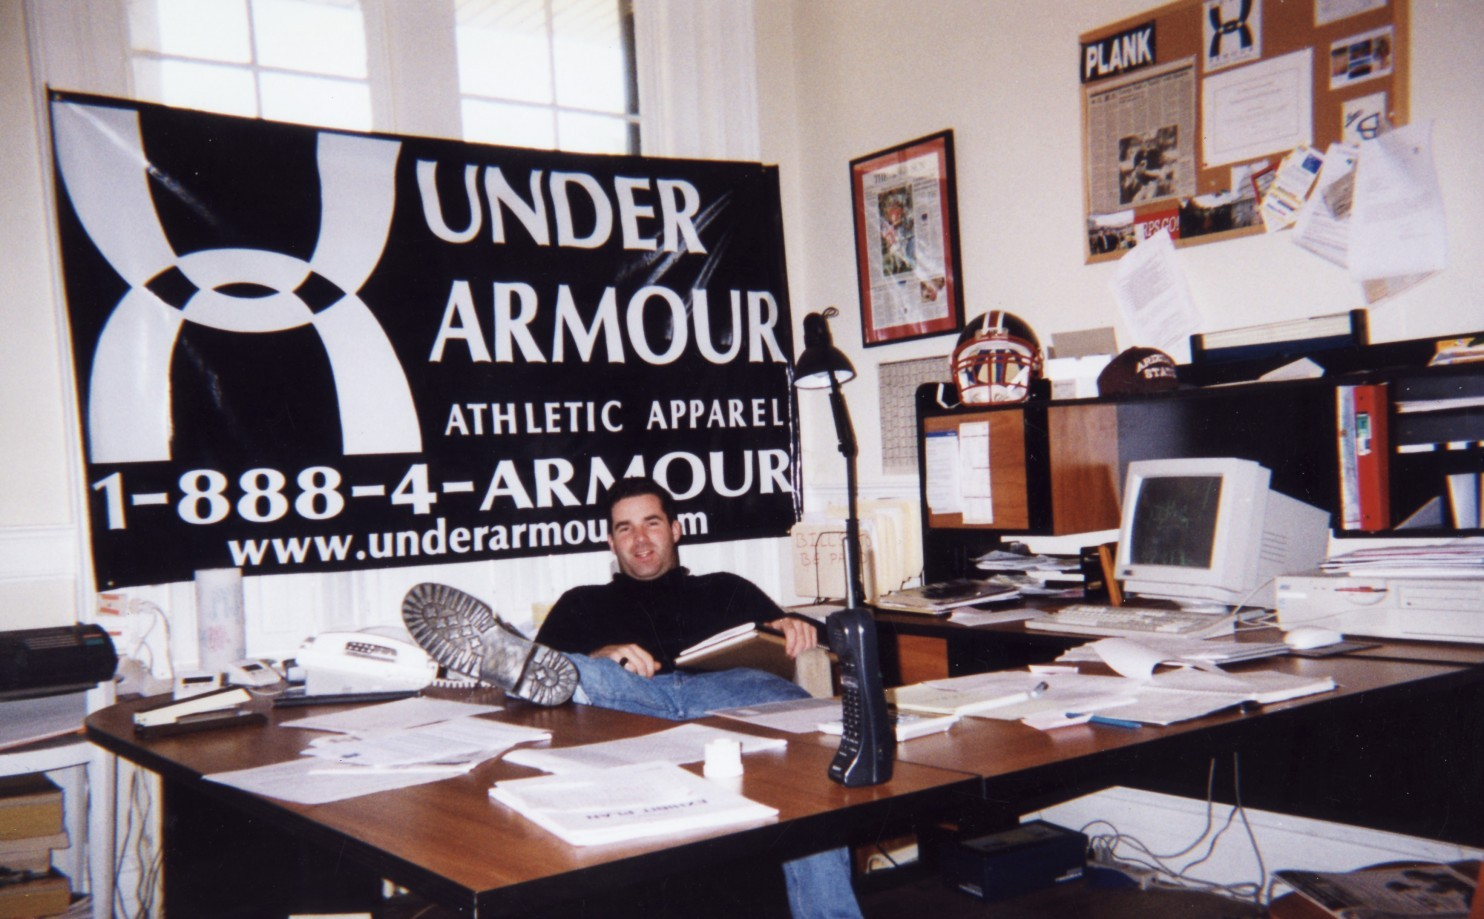 Under Armour 20周年:完成从0到1的普朗克,如何从1到10?